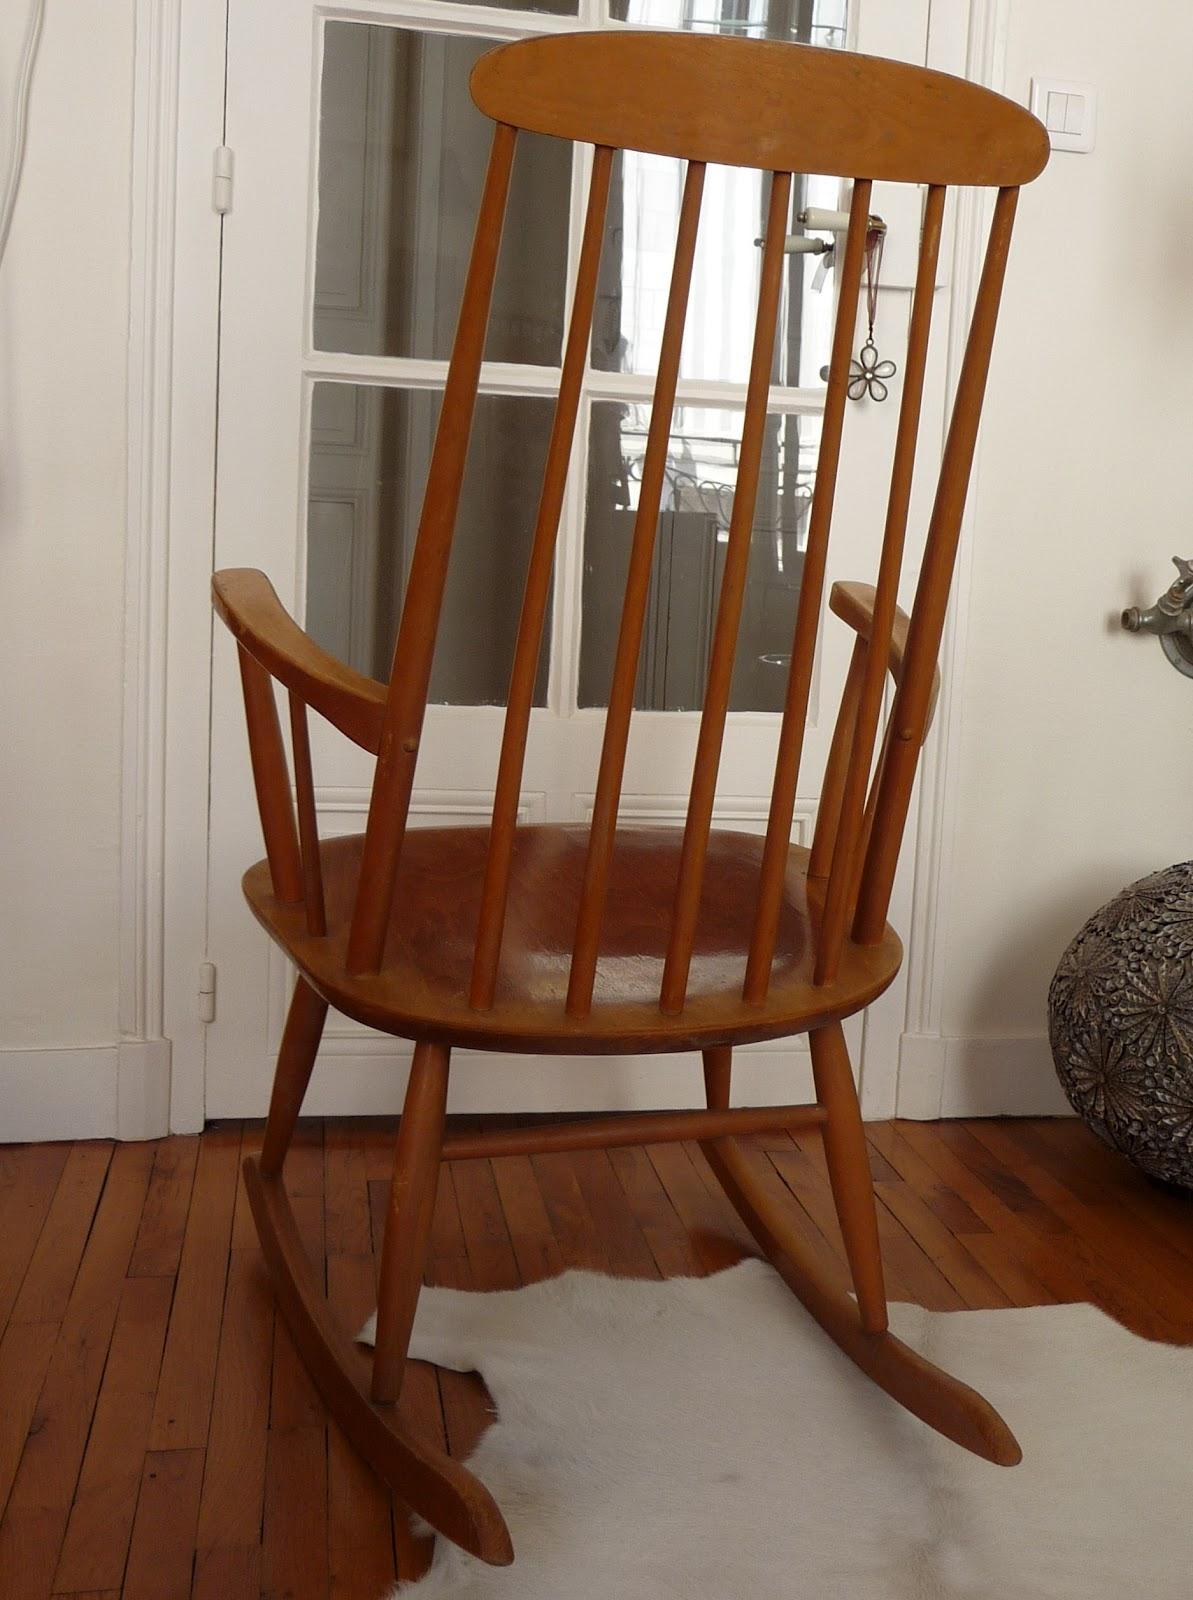 dur e de vie ind termin e rare rocking chair scandinave. Black Bedroom Furniture Sets. Home Design Ideas